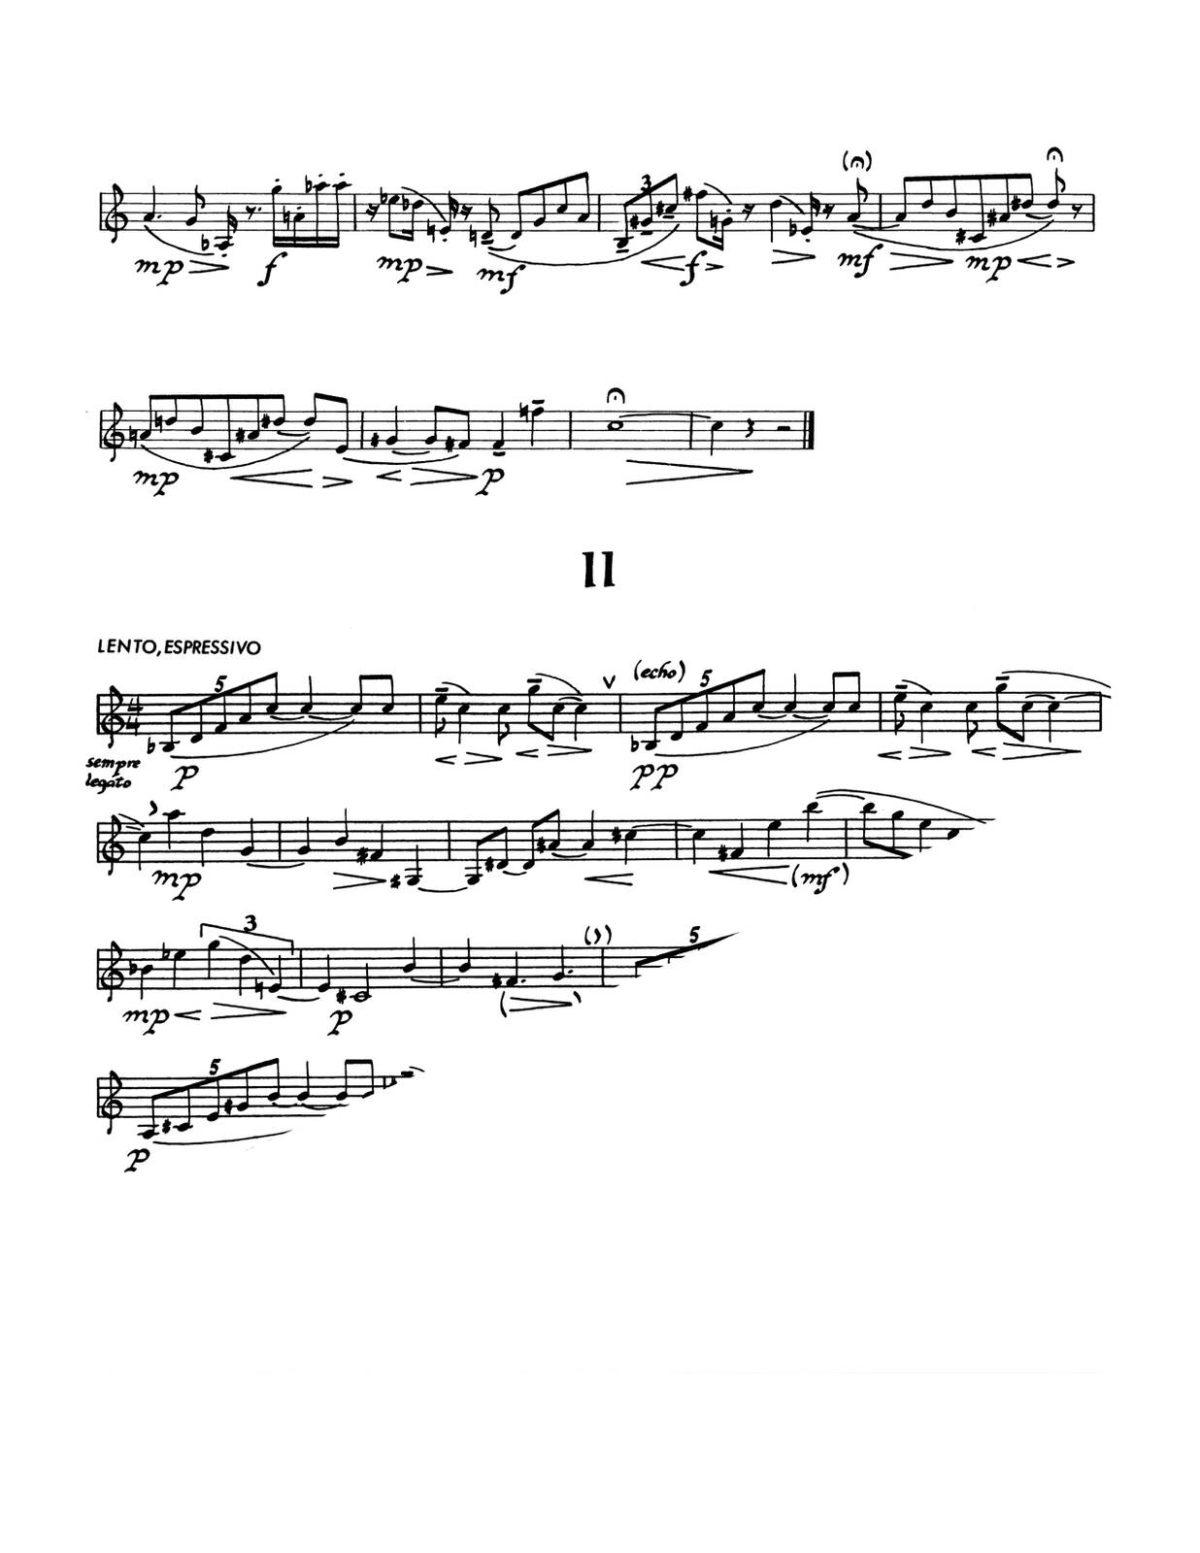 Darter, Sonatina (3 Aphorisms) for Unaccompanied Trumpet-p3